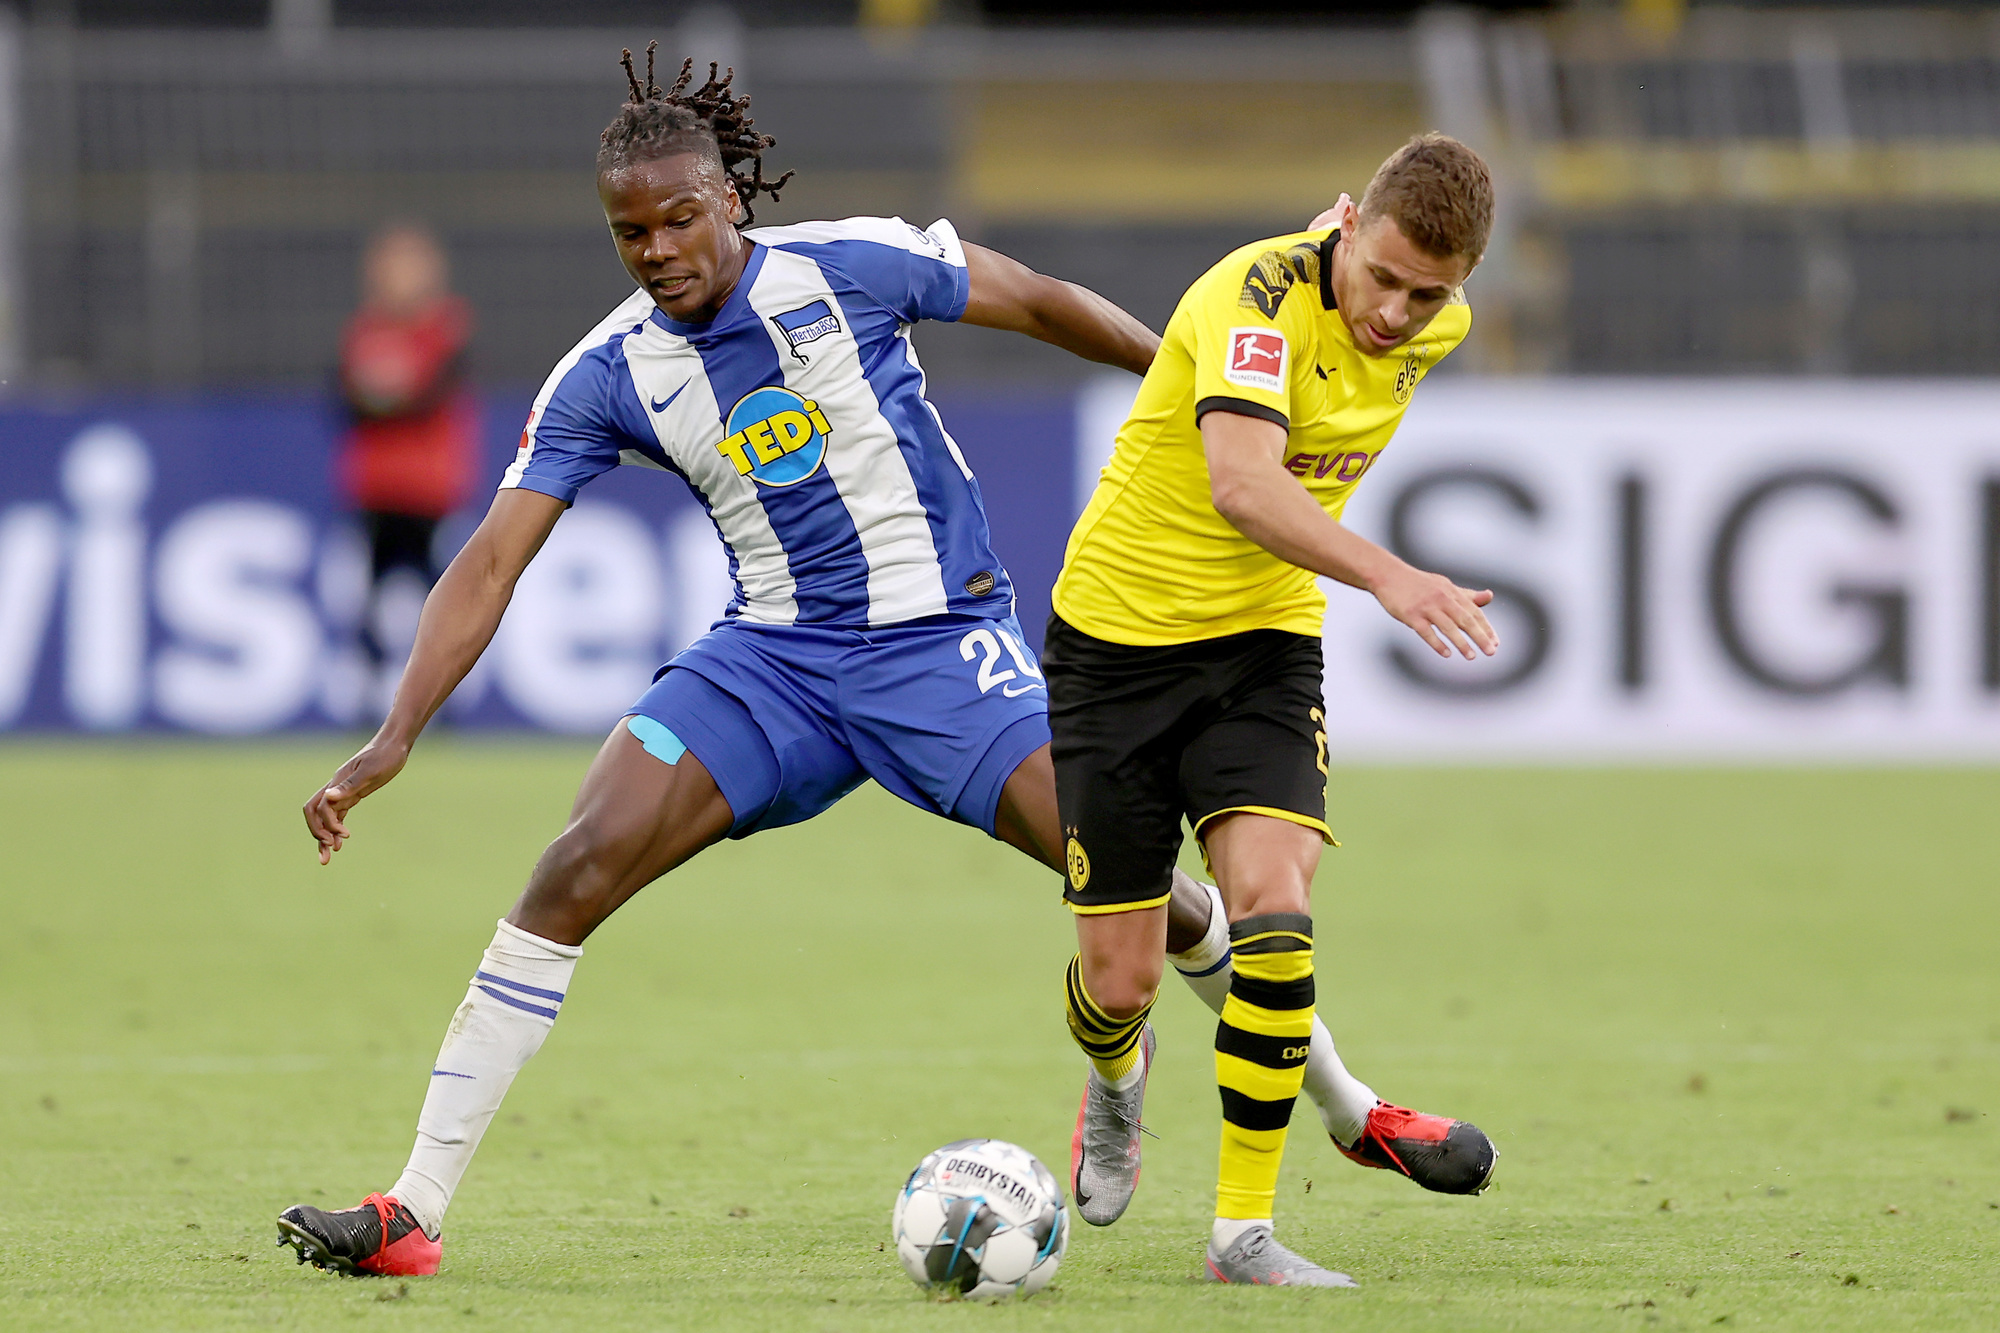 Dedryck Boyata, face au Borussia Dortmund de Thorgan Hazard, en Bundesliga., belga